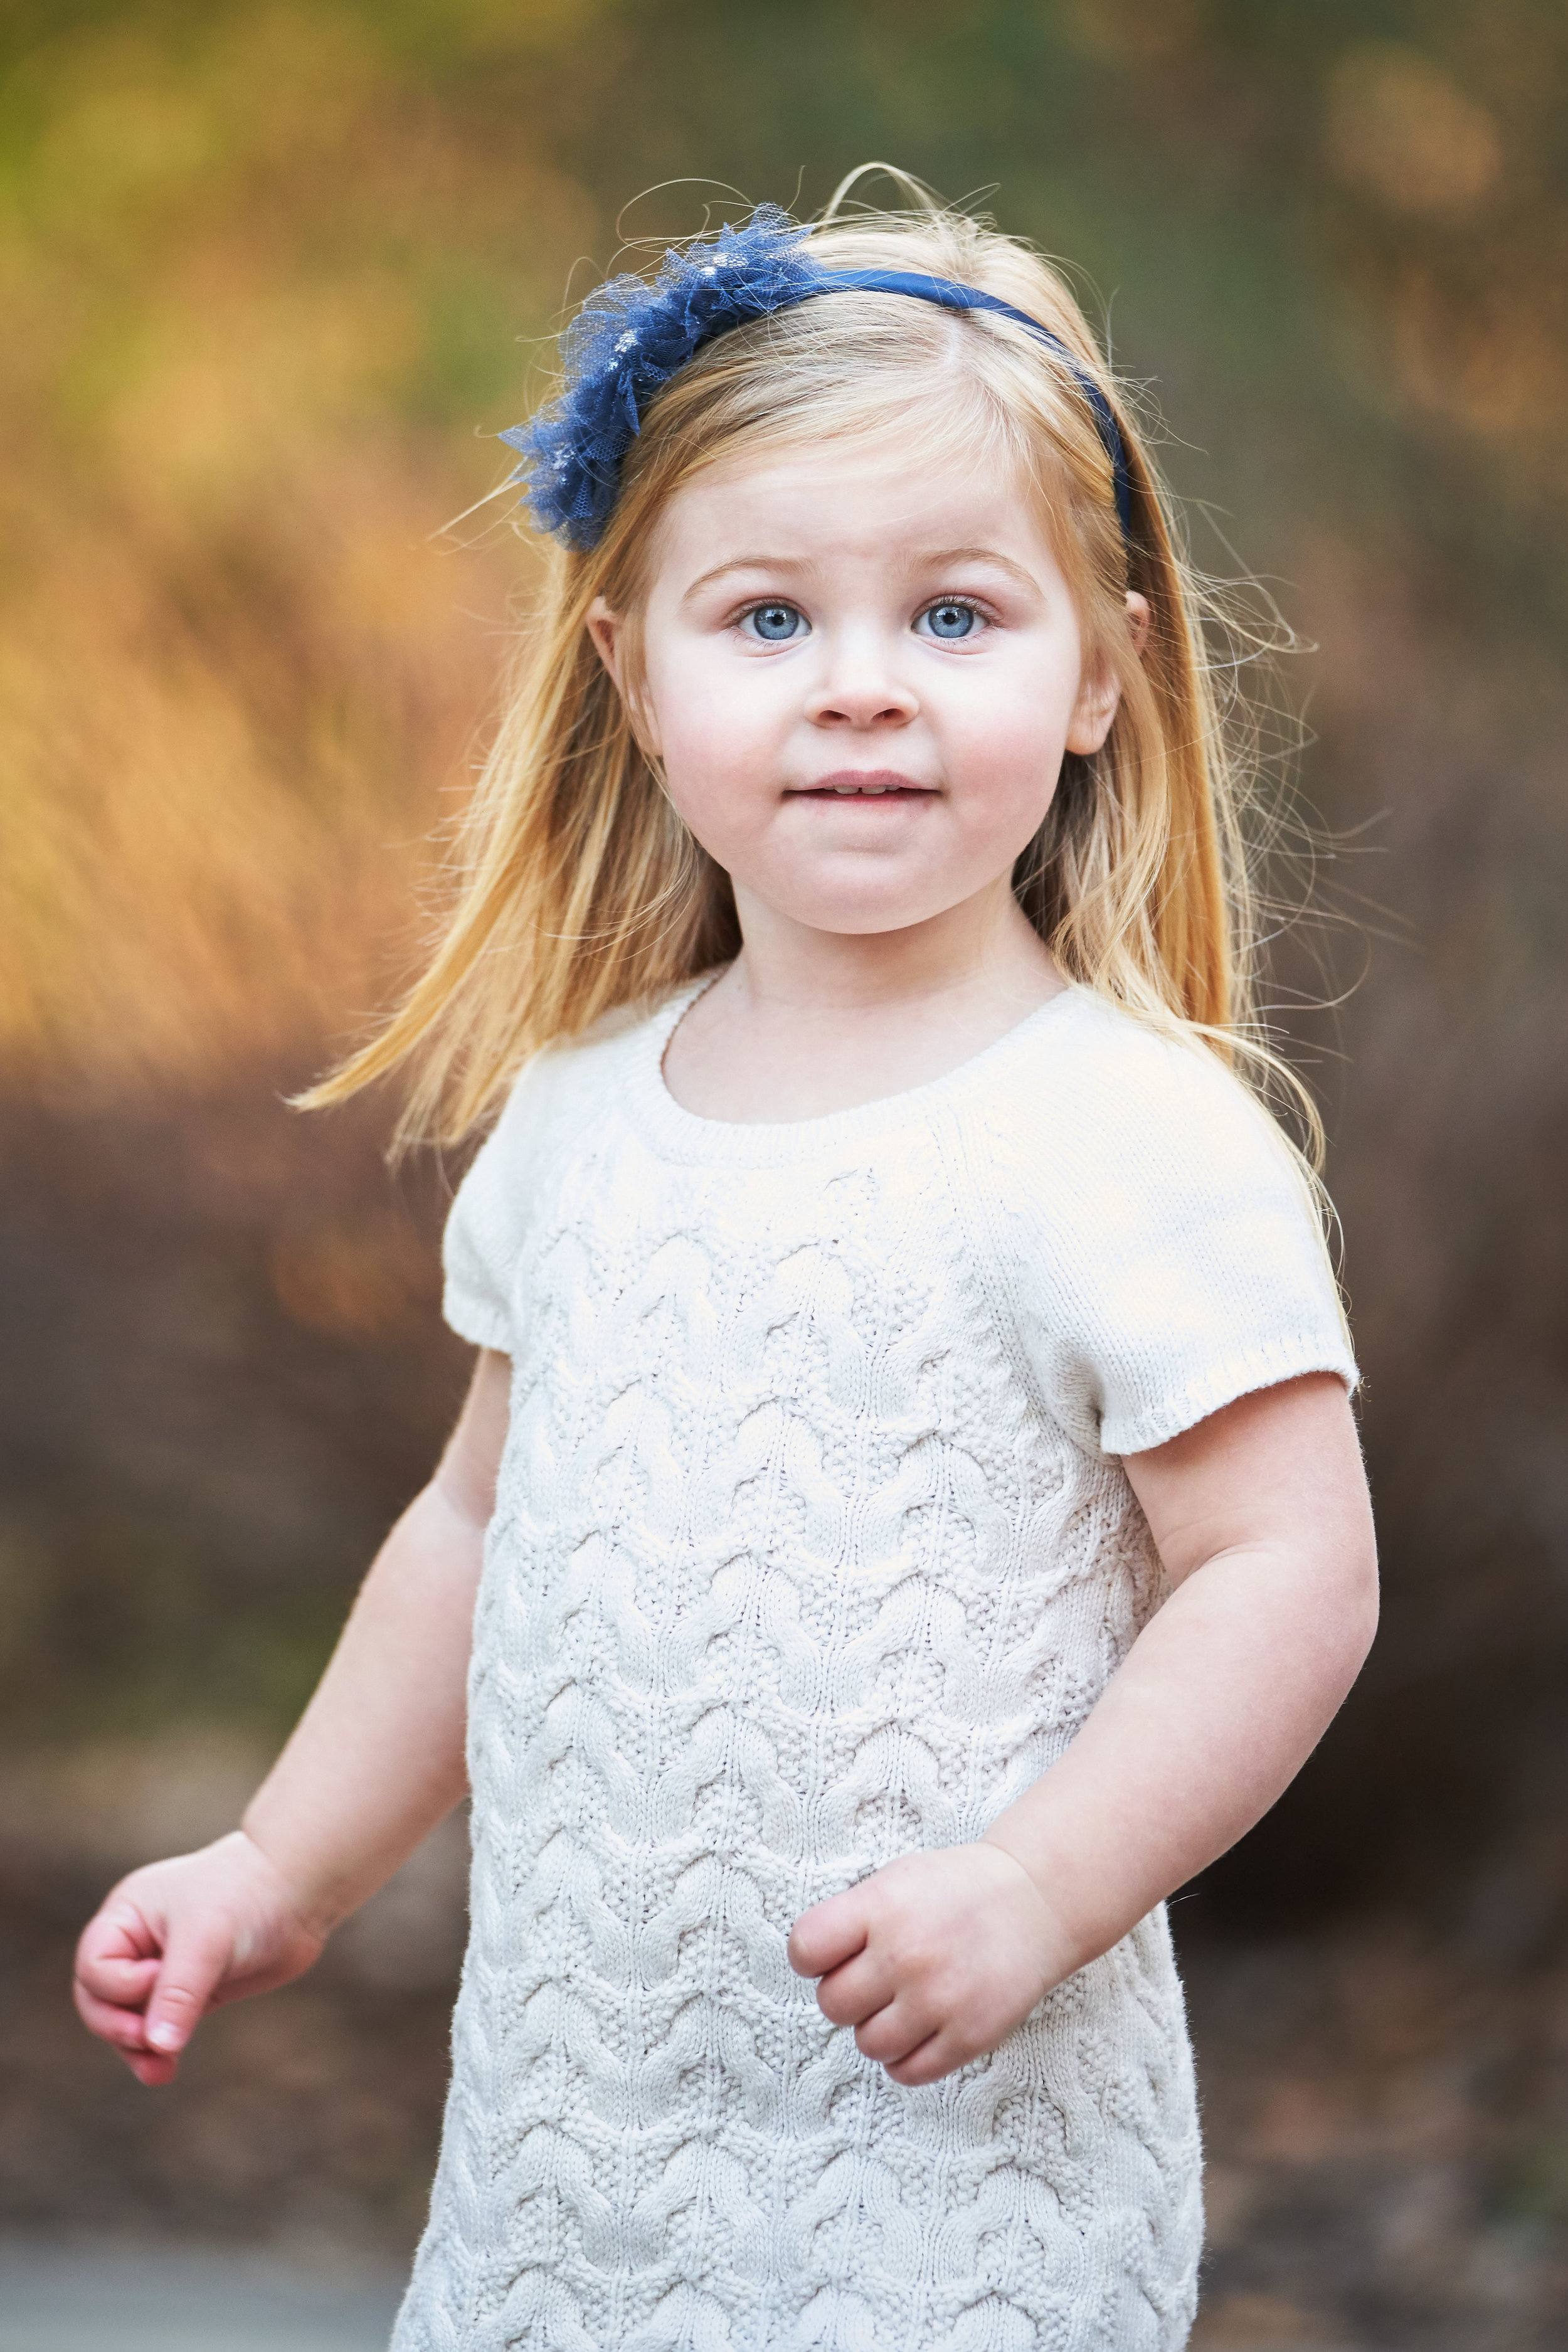 Little Sister | Family Photo Session at the Clemson Botanical Gardens